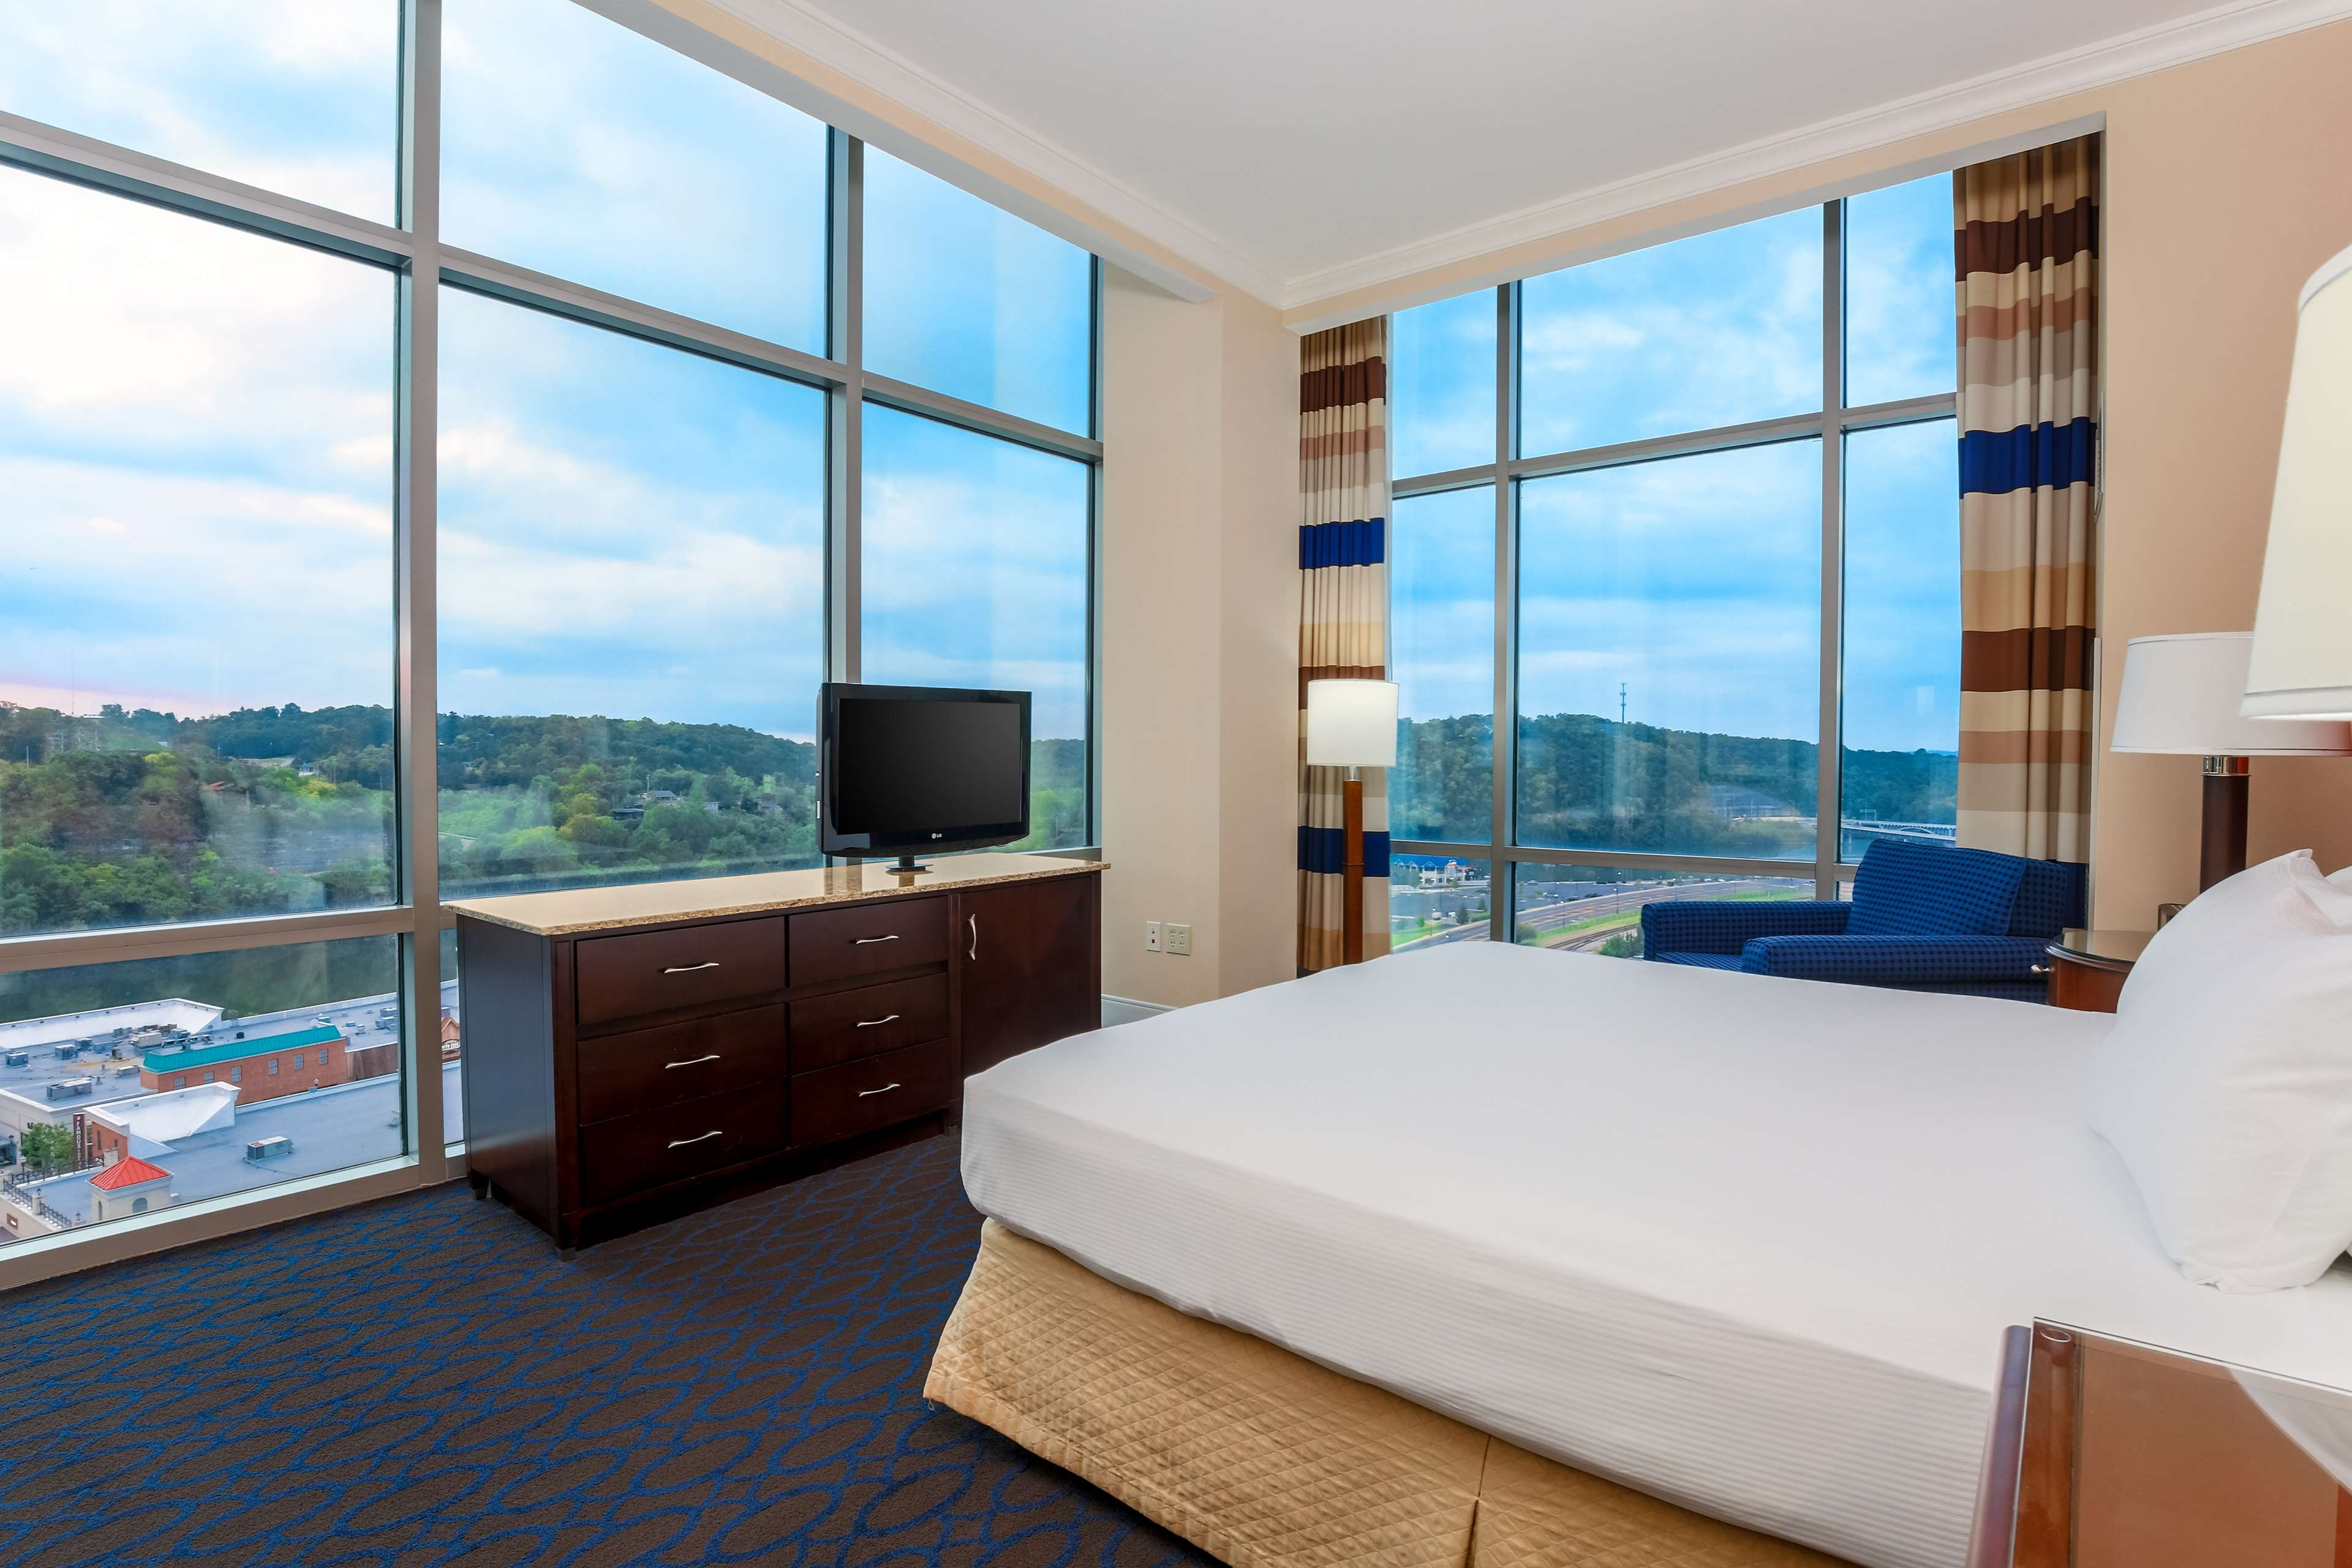 Hilton Branson Convention Center image 26